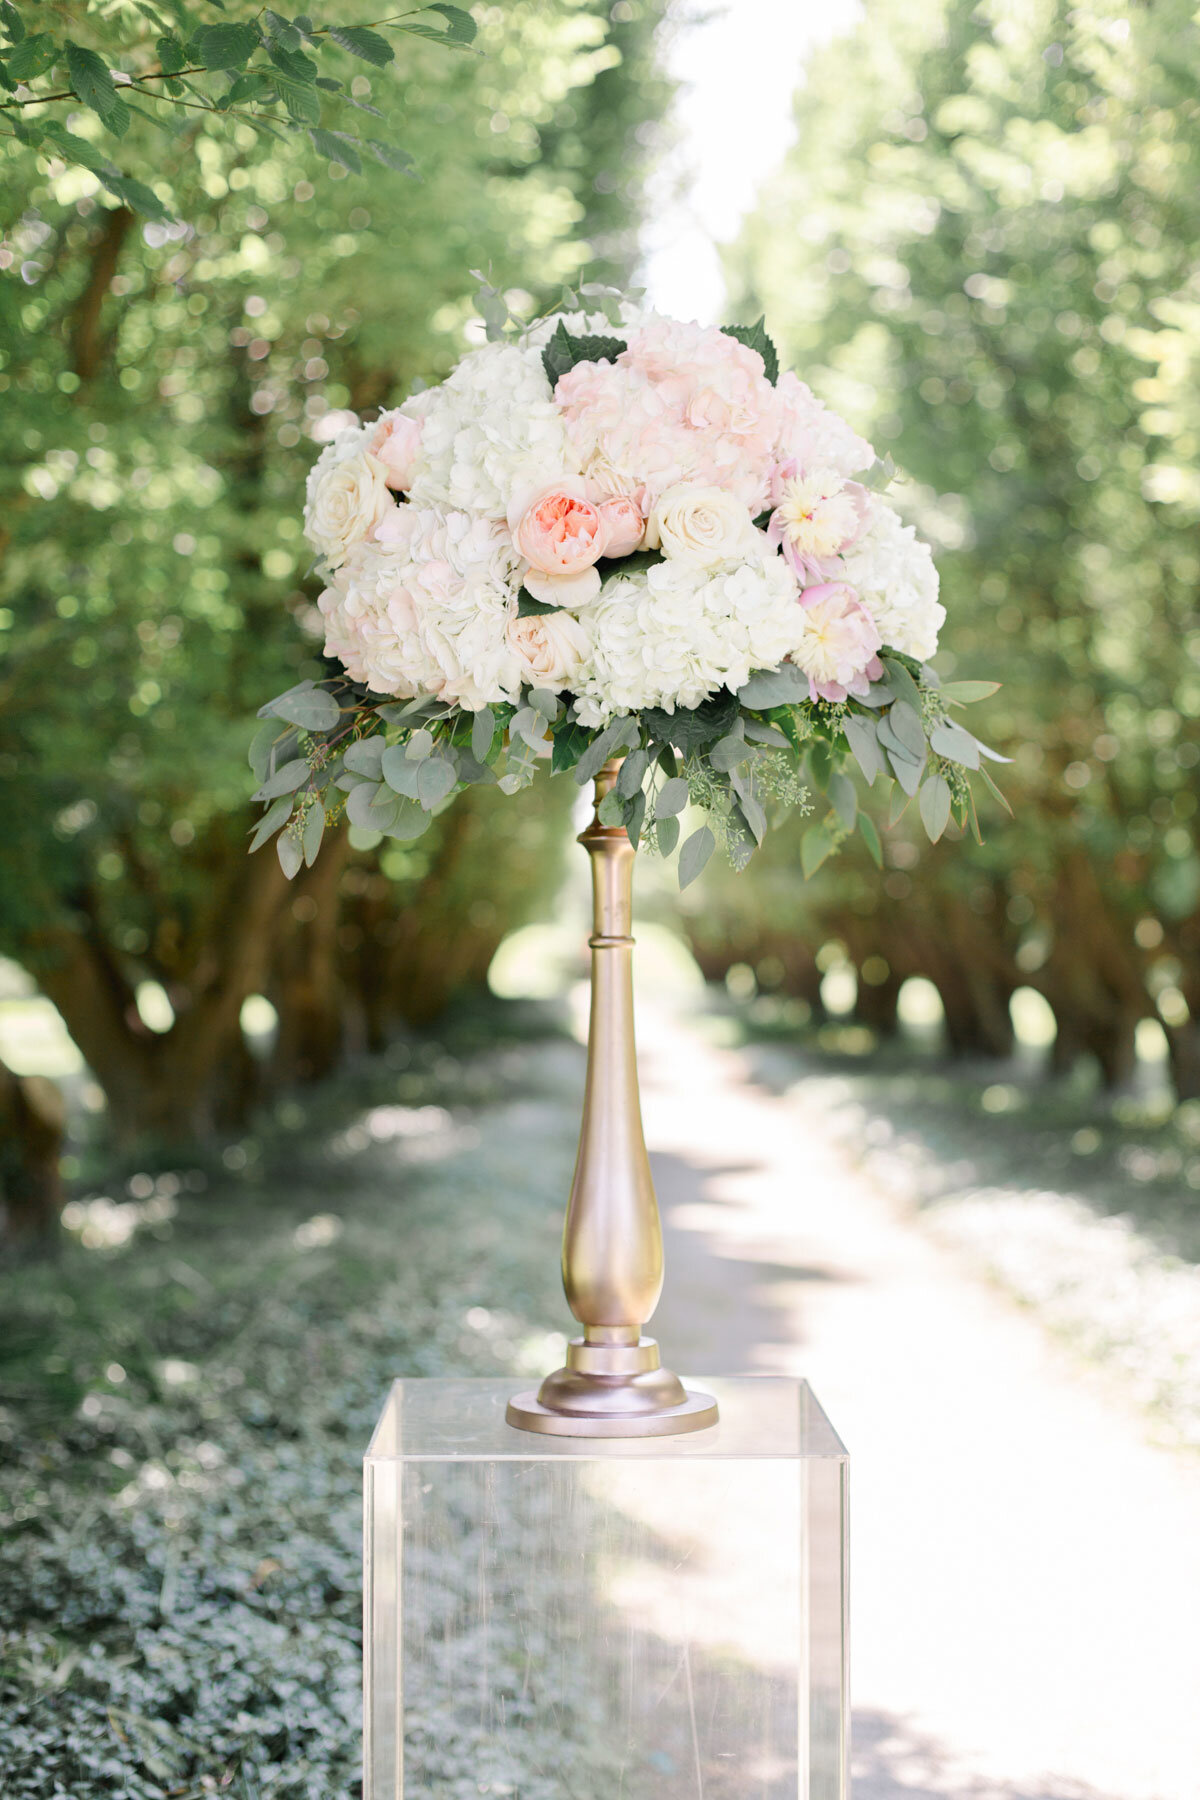 Chateau-des-Charmes-Wedding-Summer-Vineyard-Bride-Niagara-on-the-Lake-photos-by-Gemini-Photography-Ontario-0012.jpg